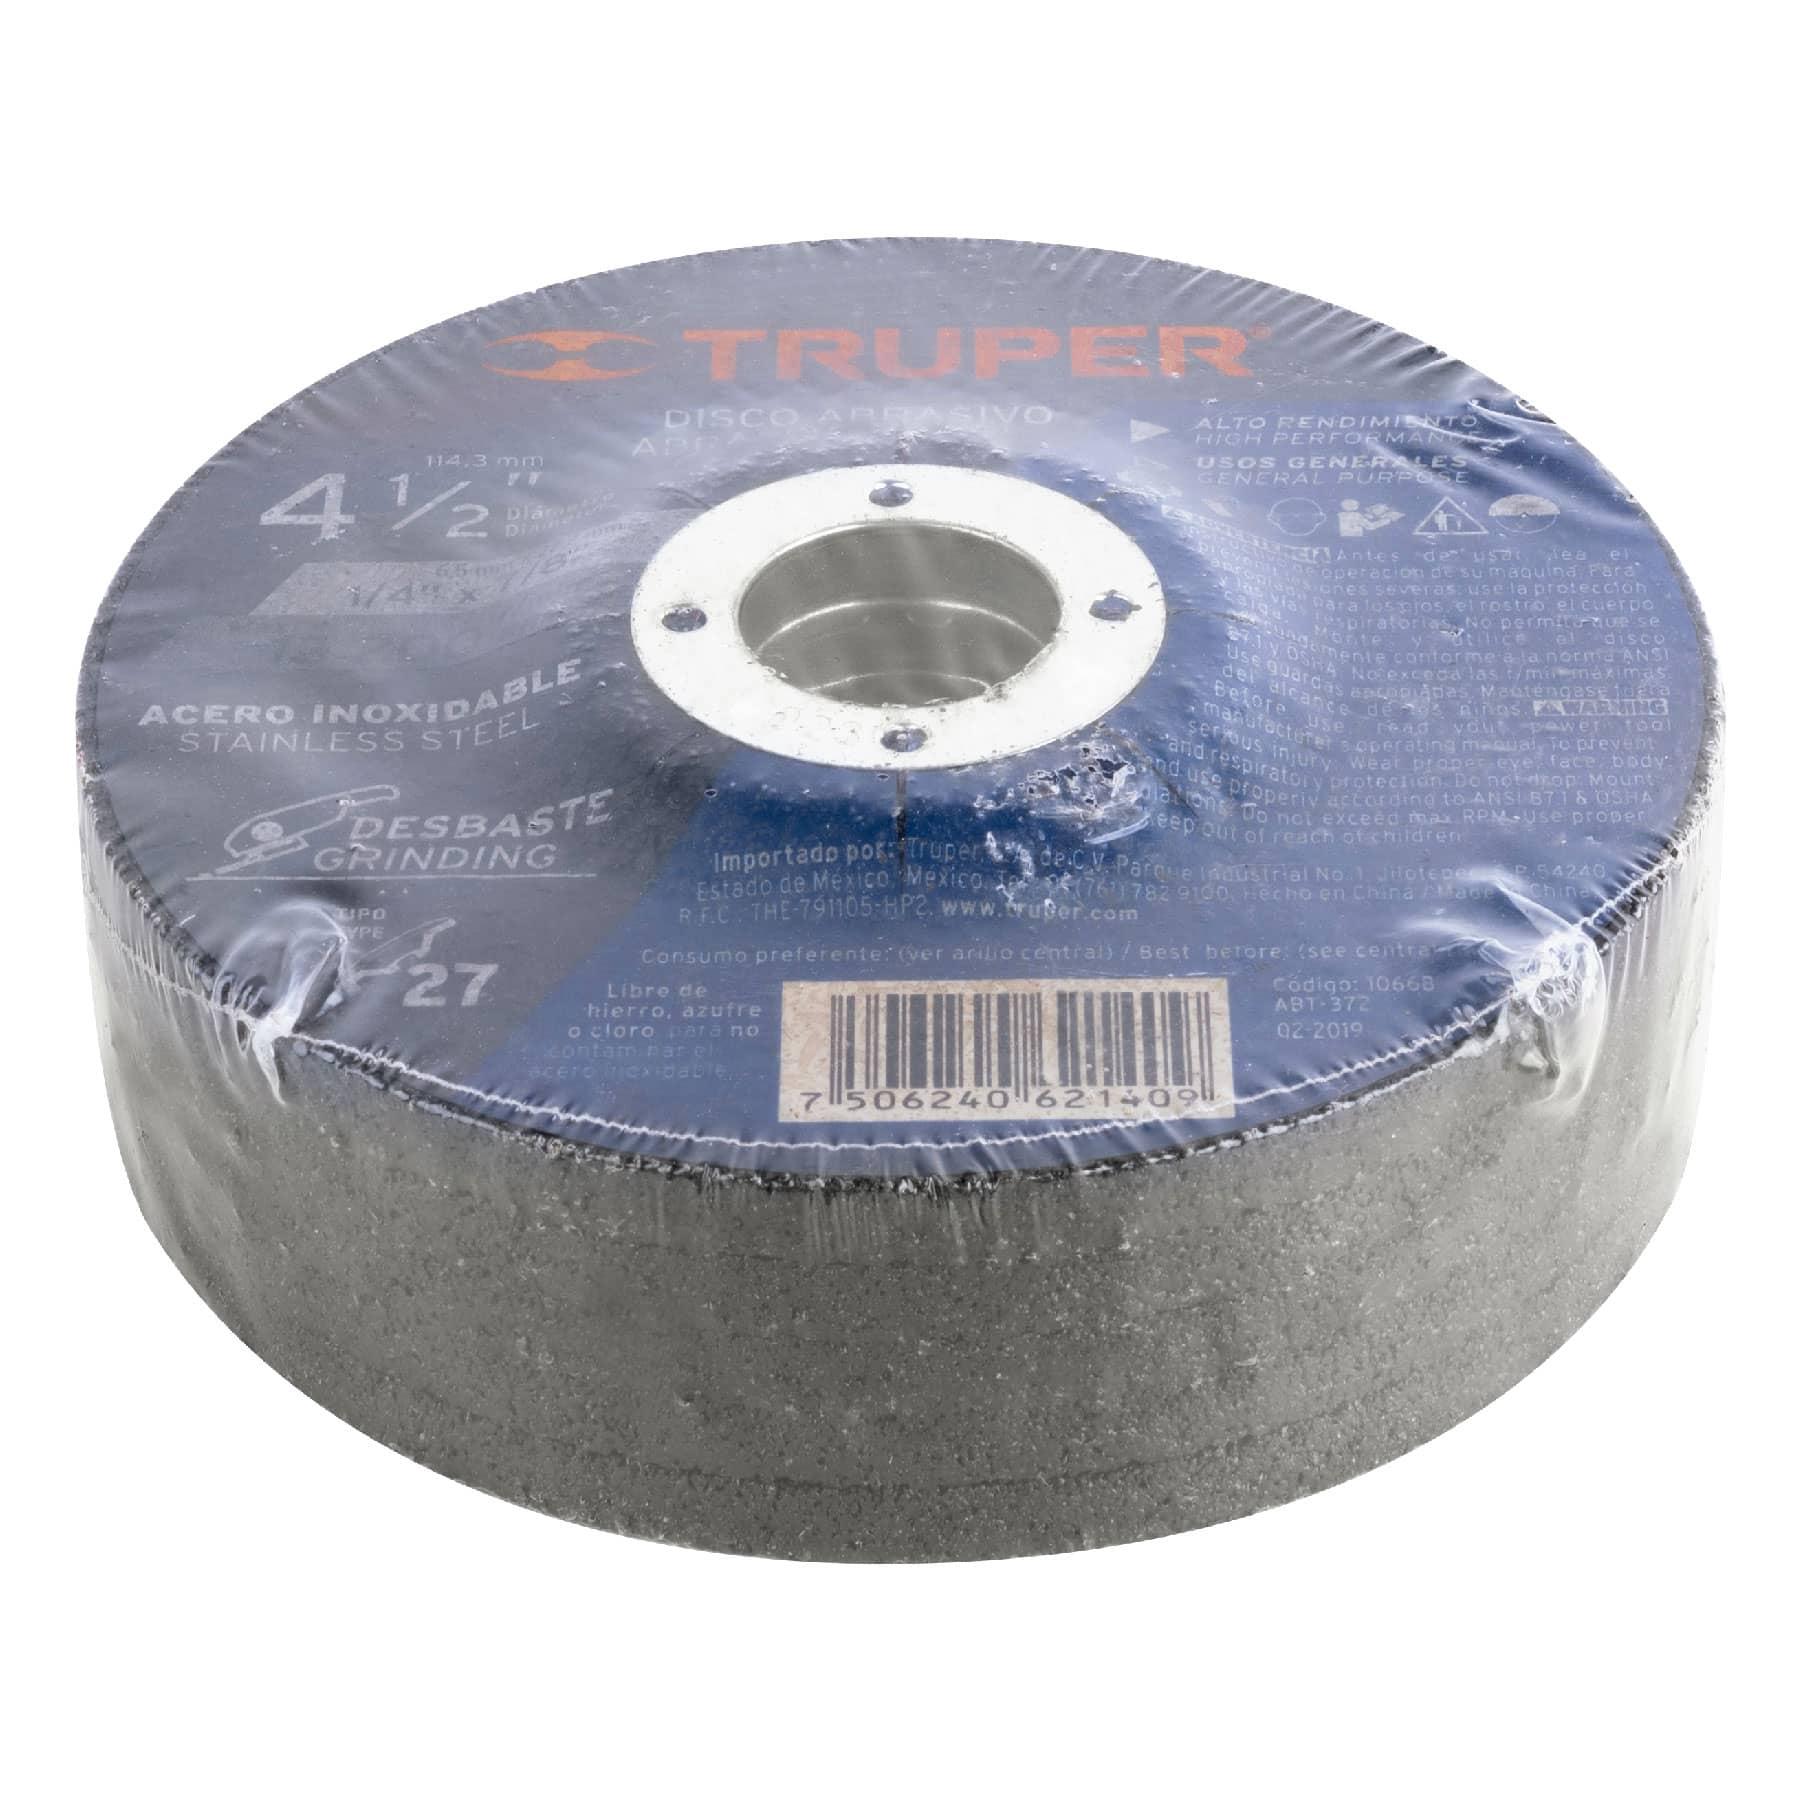 Truper - Disco para desbaste de acero inoxidable, tipo 27, 4-1/2